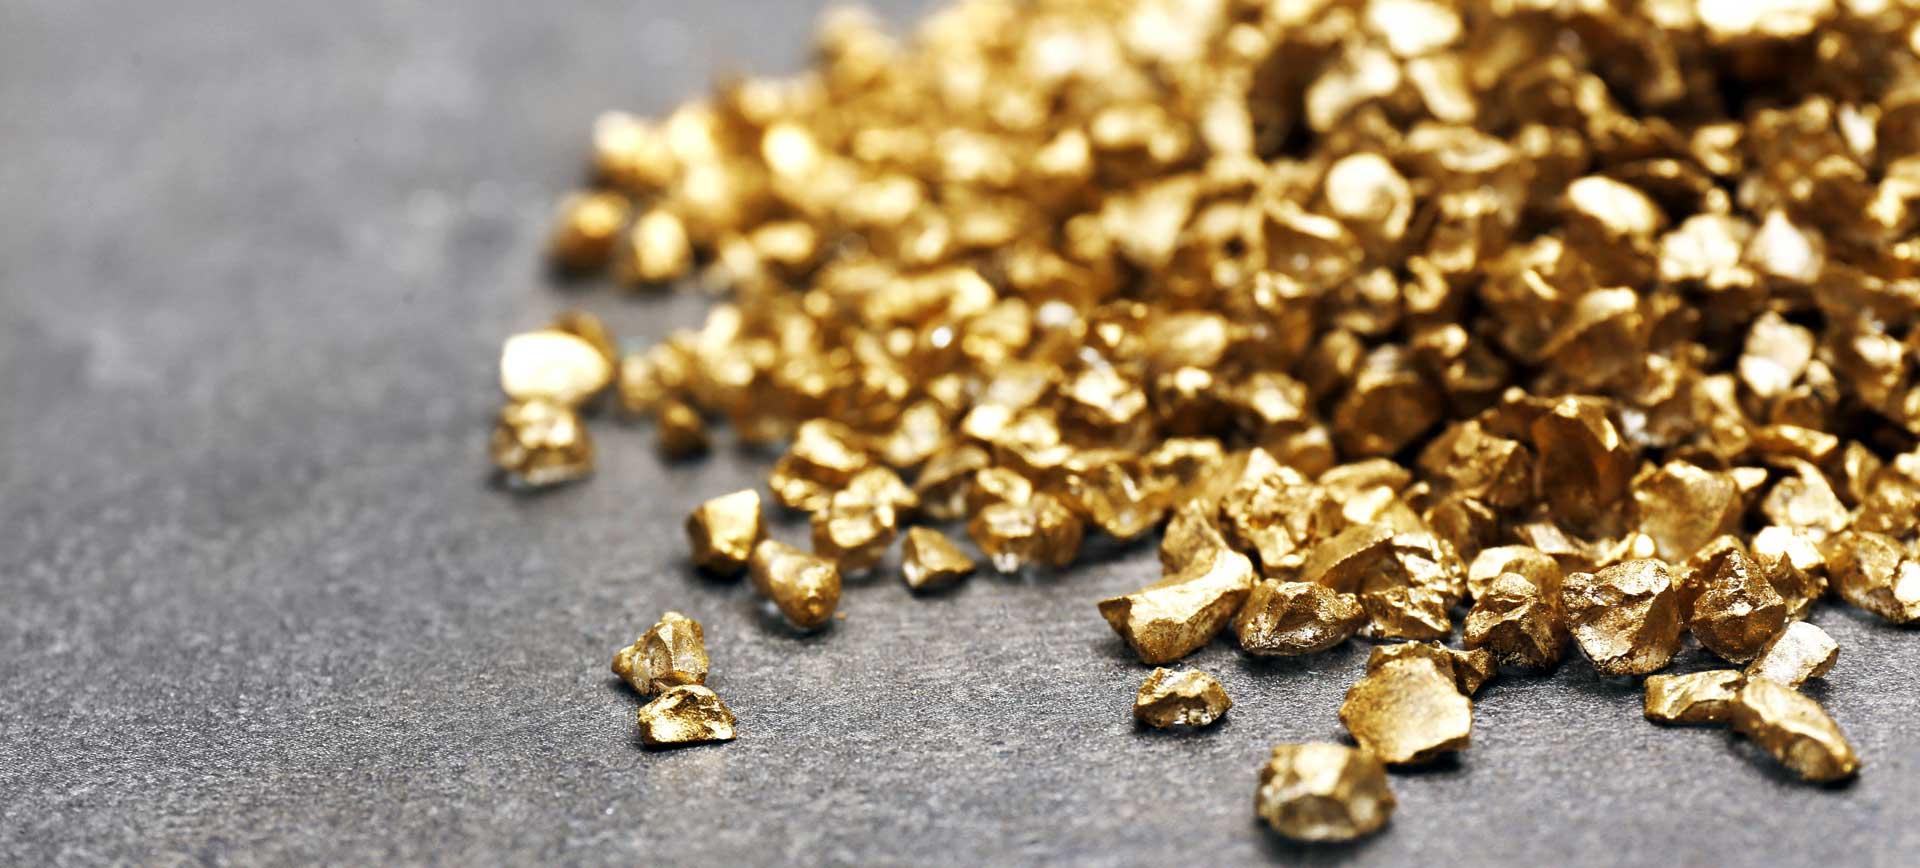 Goldgeschenke